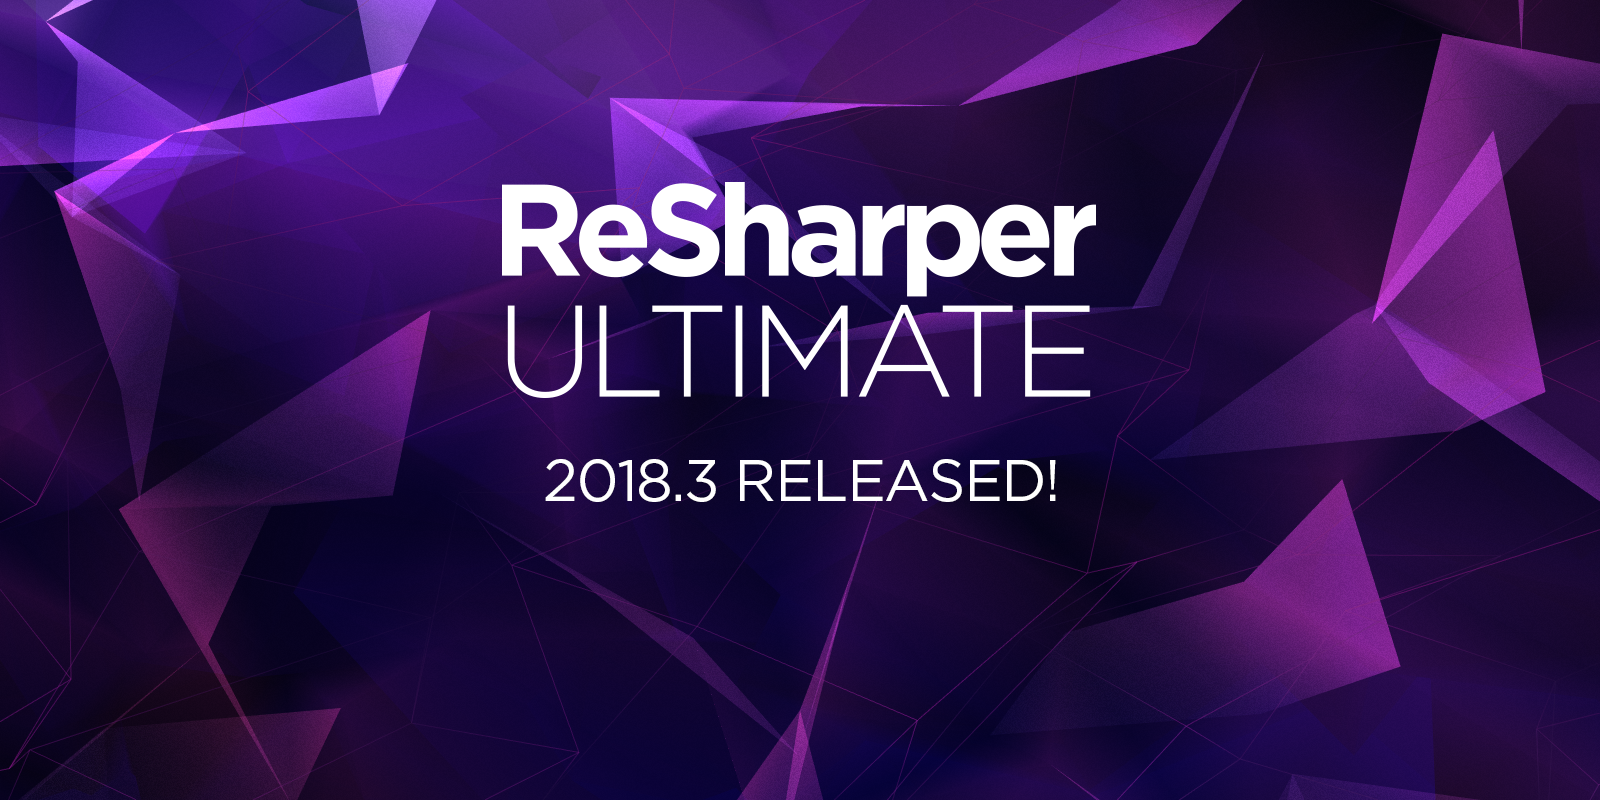 ReSharper Ultimate 2018.3がリリースされました!